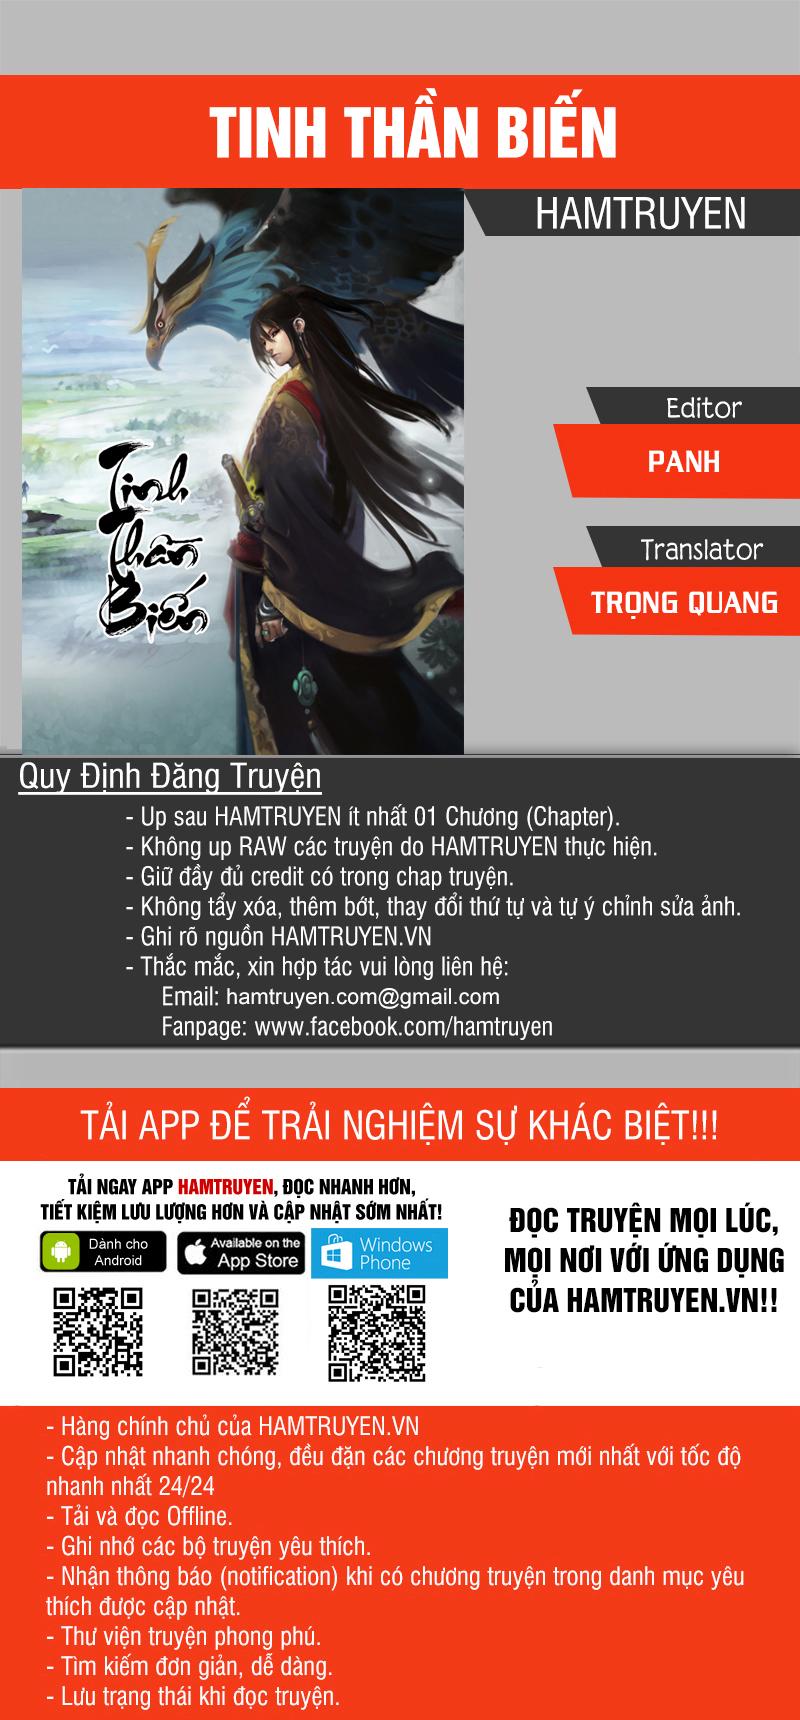 Tinh Thần Biến Chapter 424 - Upload bởi truyensieuhay.com